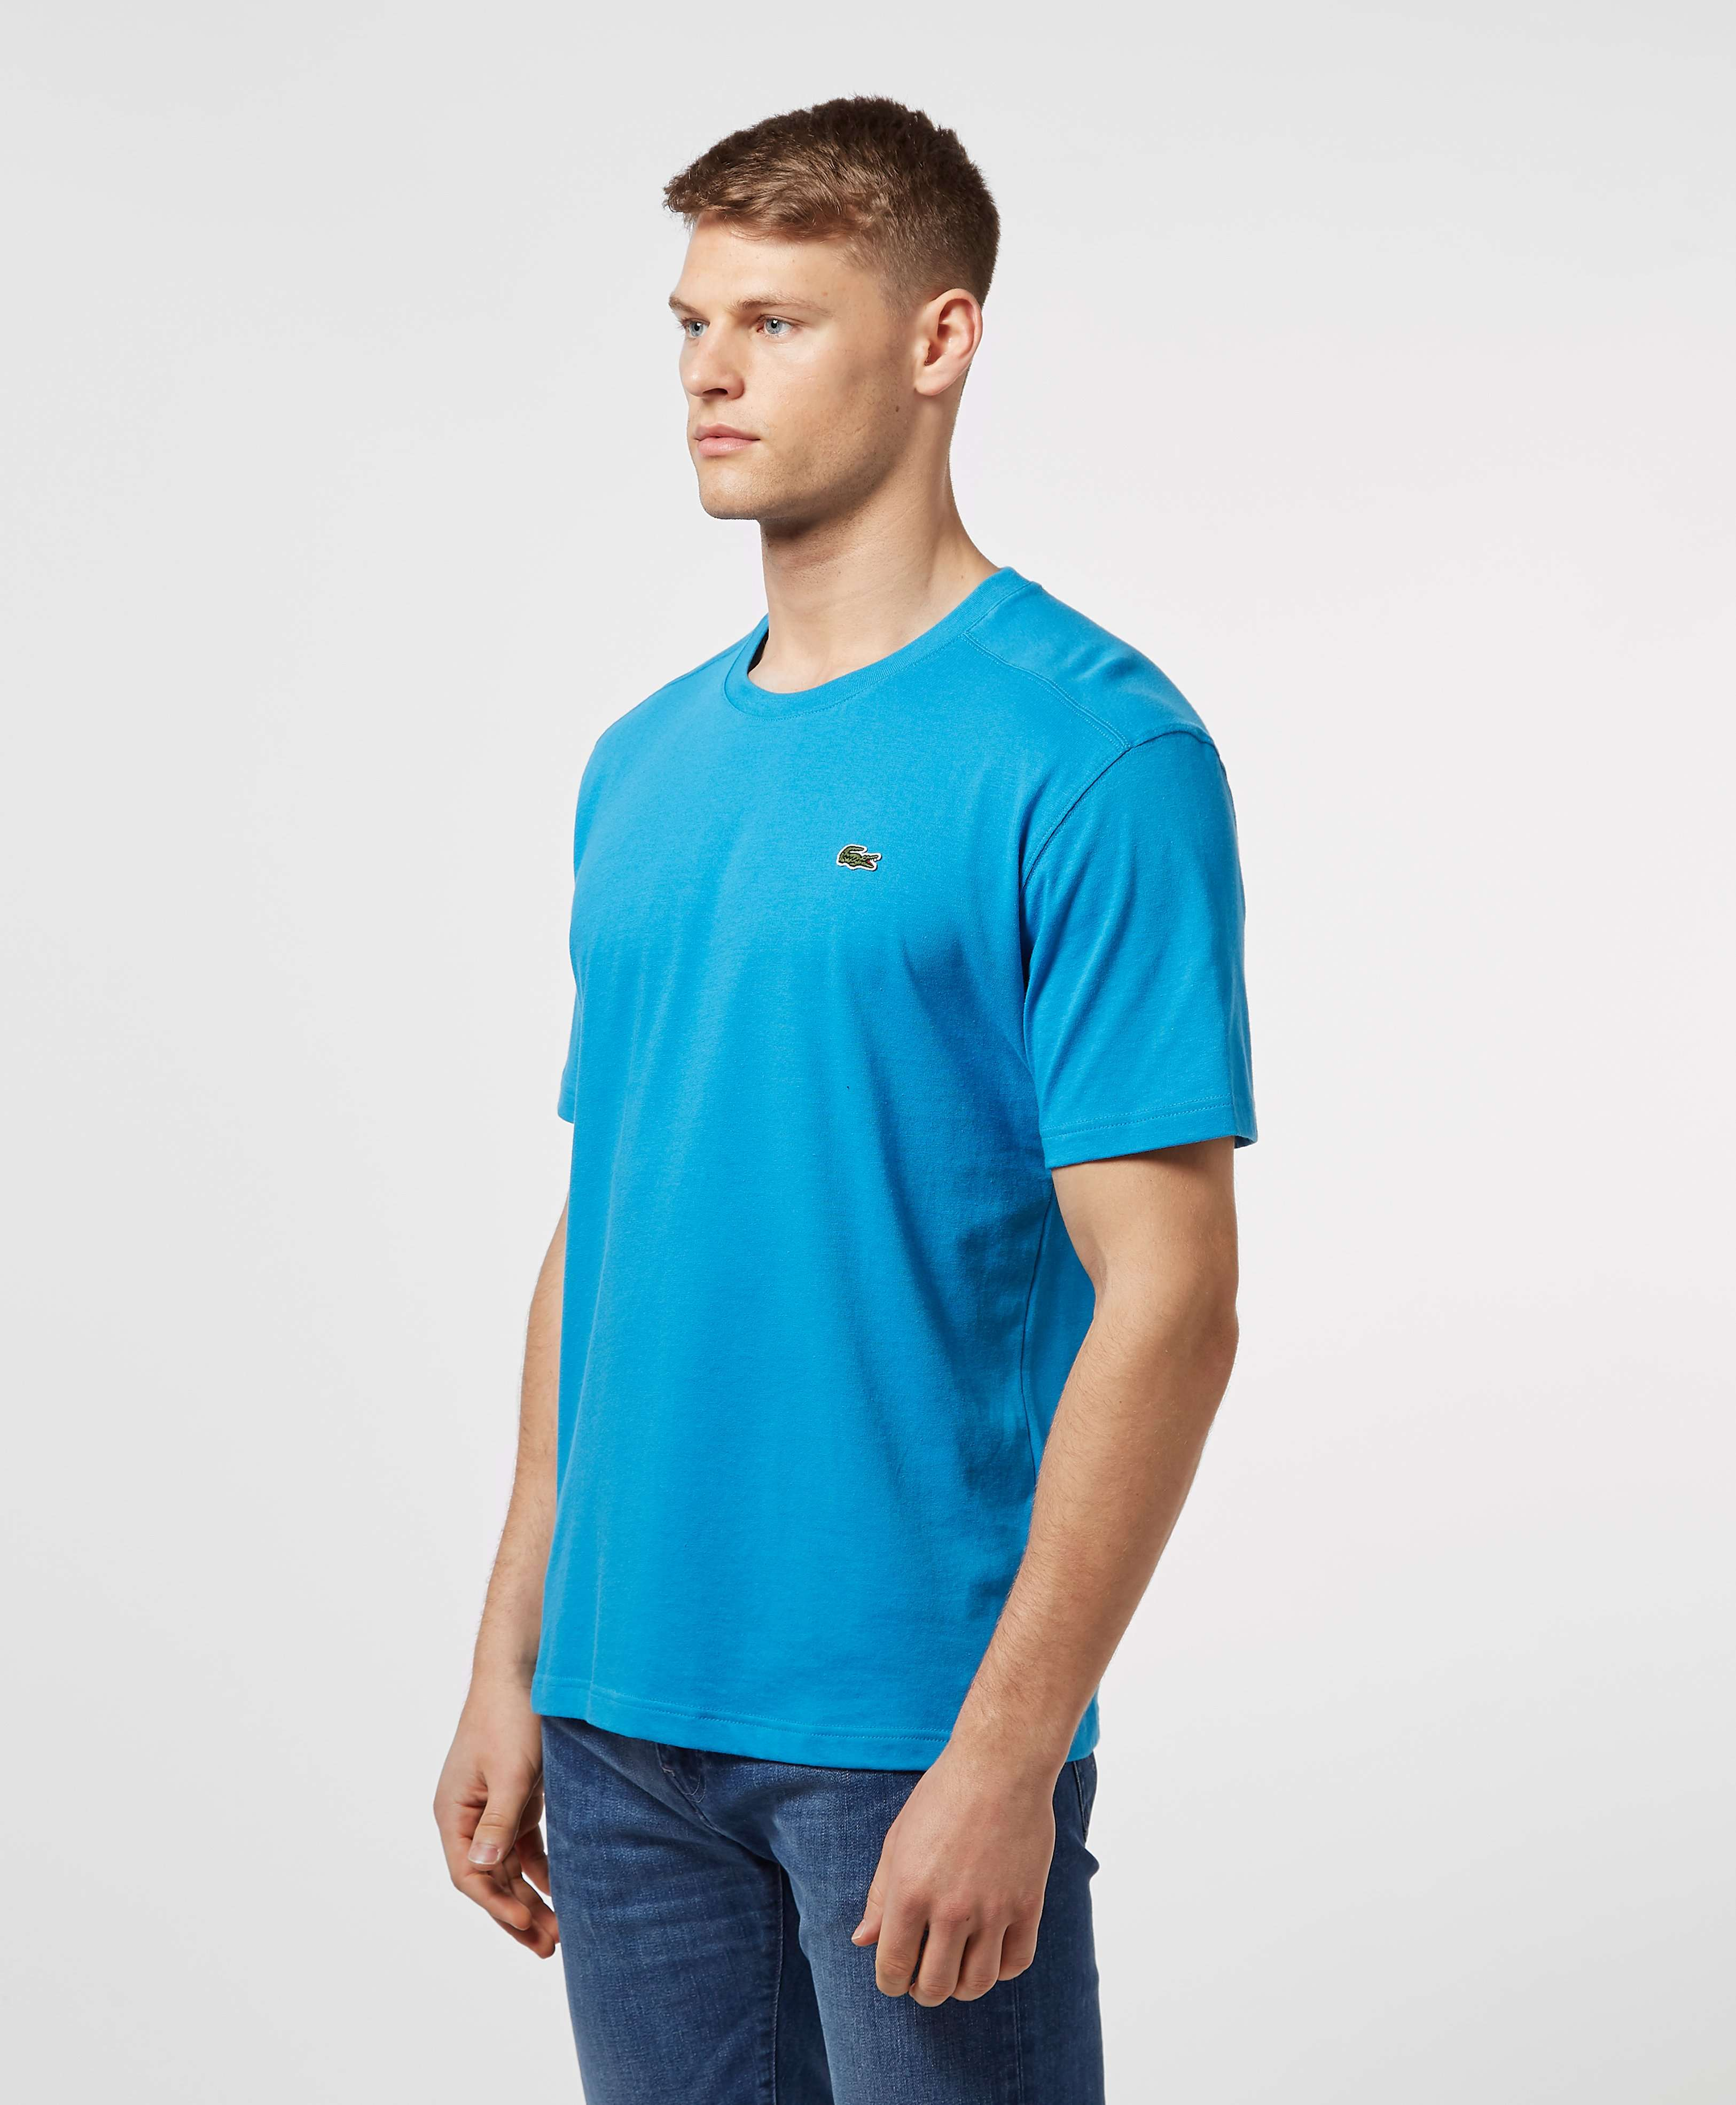 Lacoste Alligator Short Sleeve T-Shirt